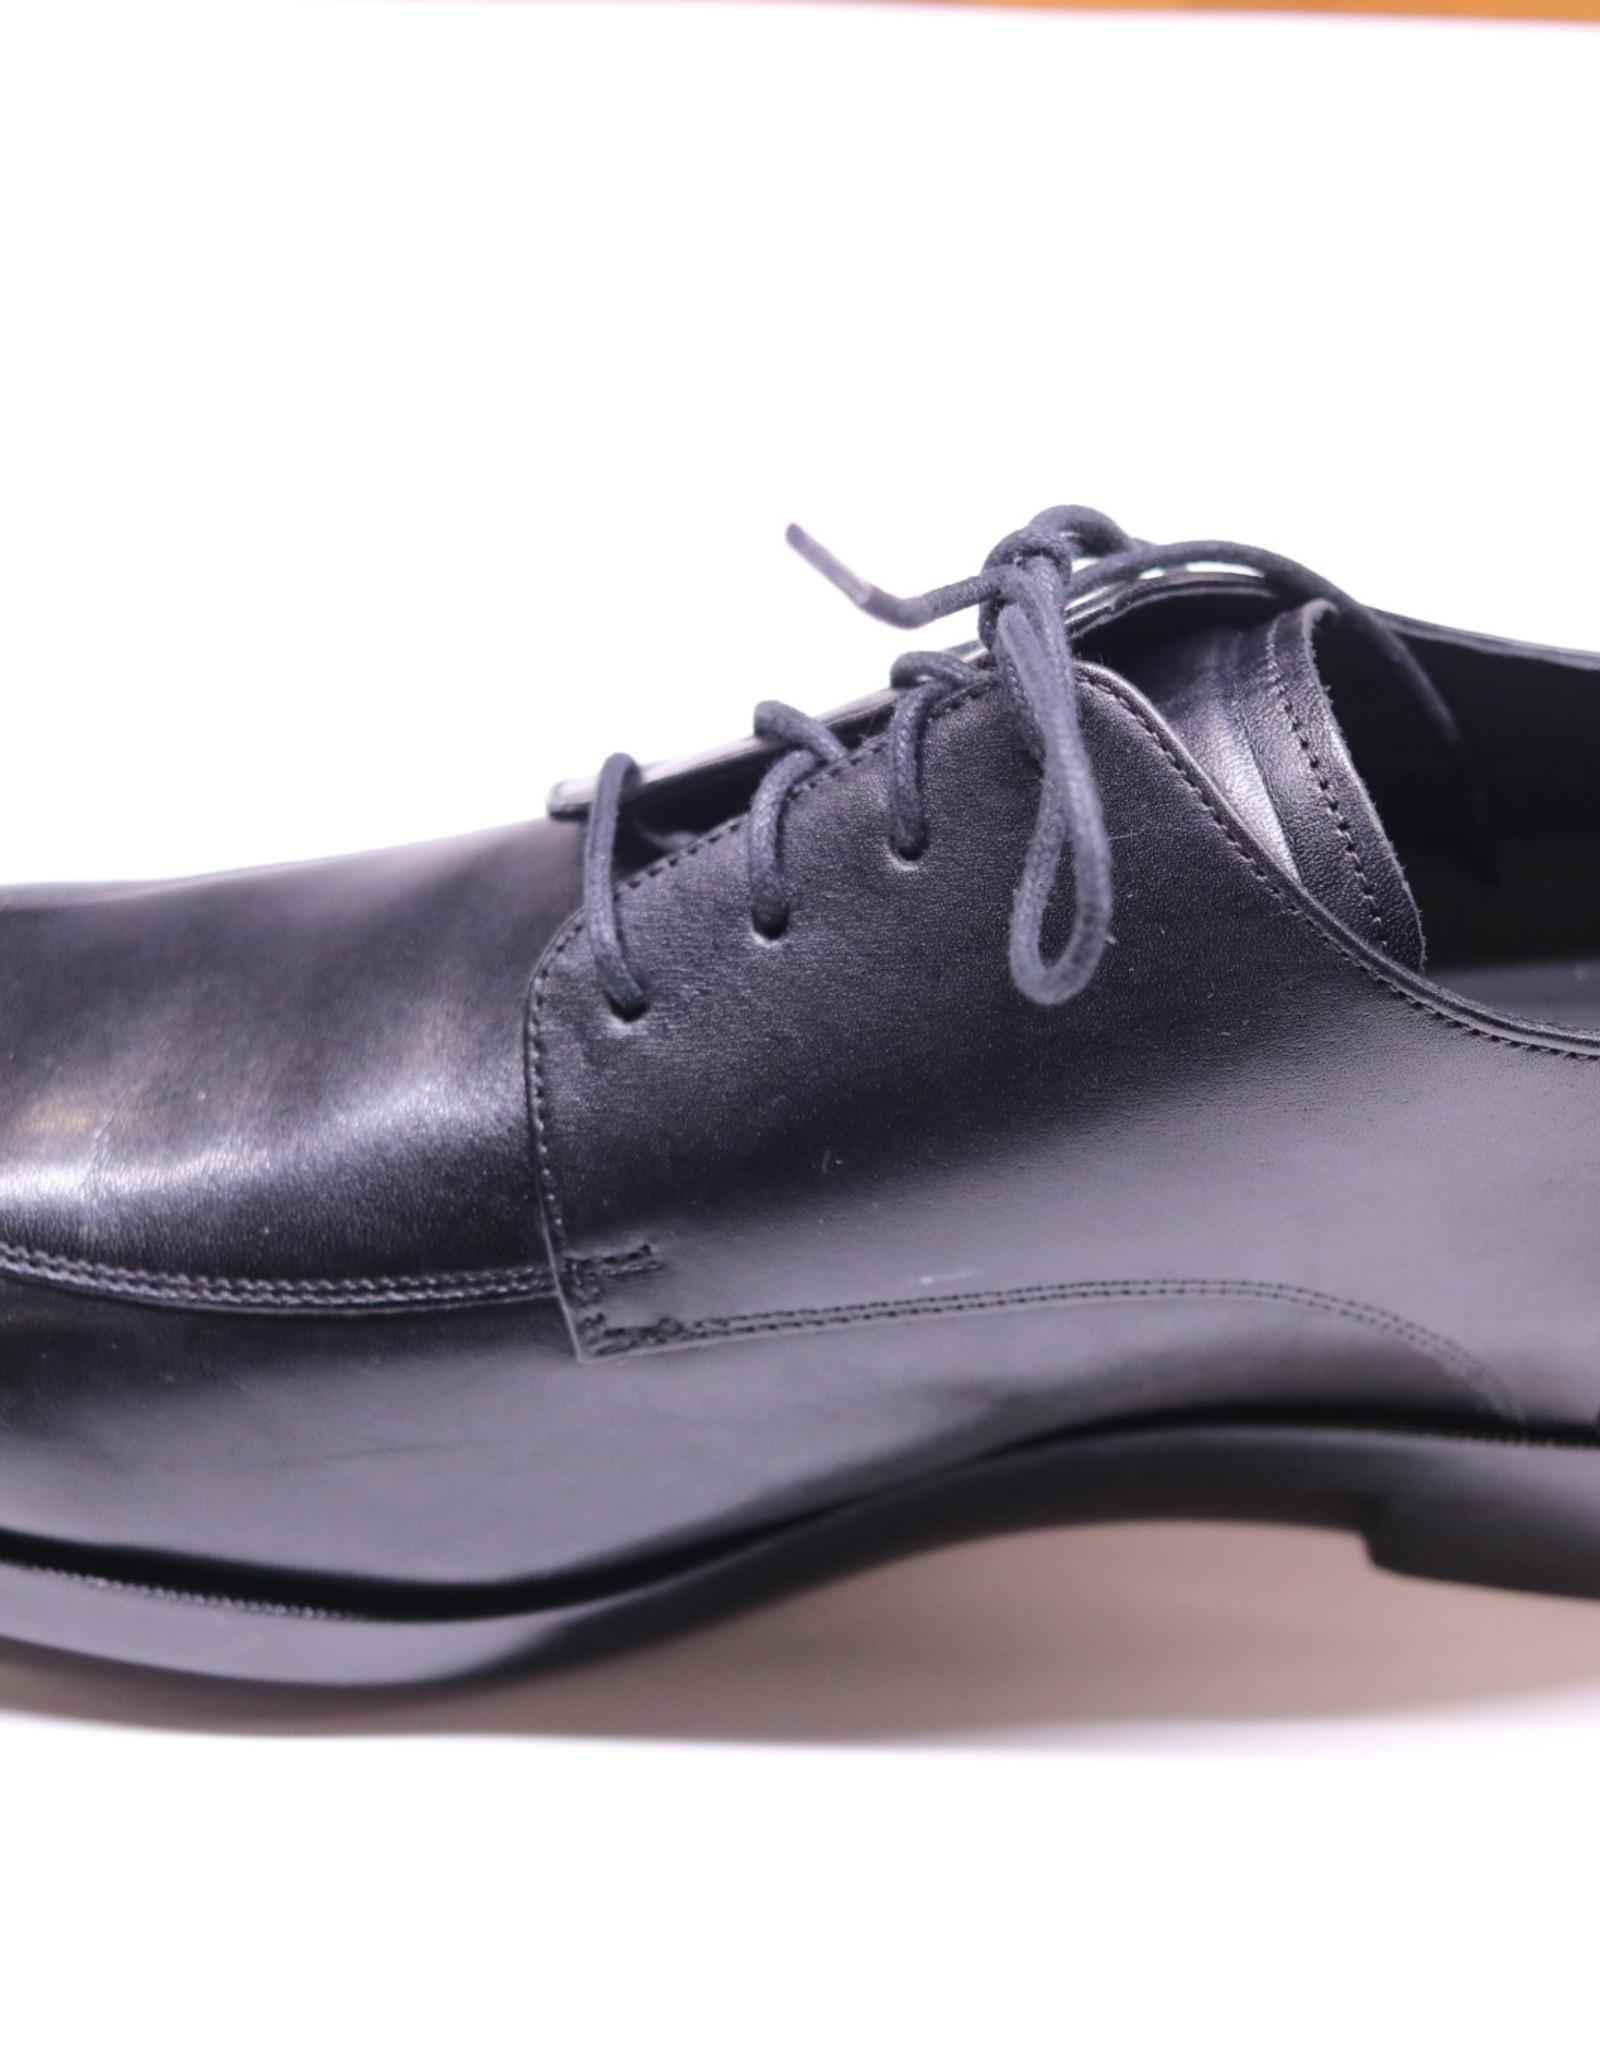 COLE HAAN C24158  Black Henry Grand Slip Ox size11.5 Reg $250